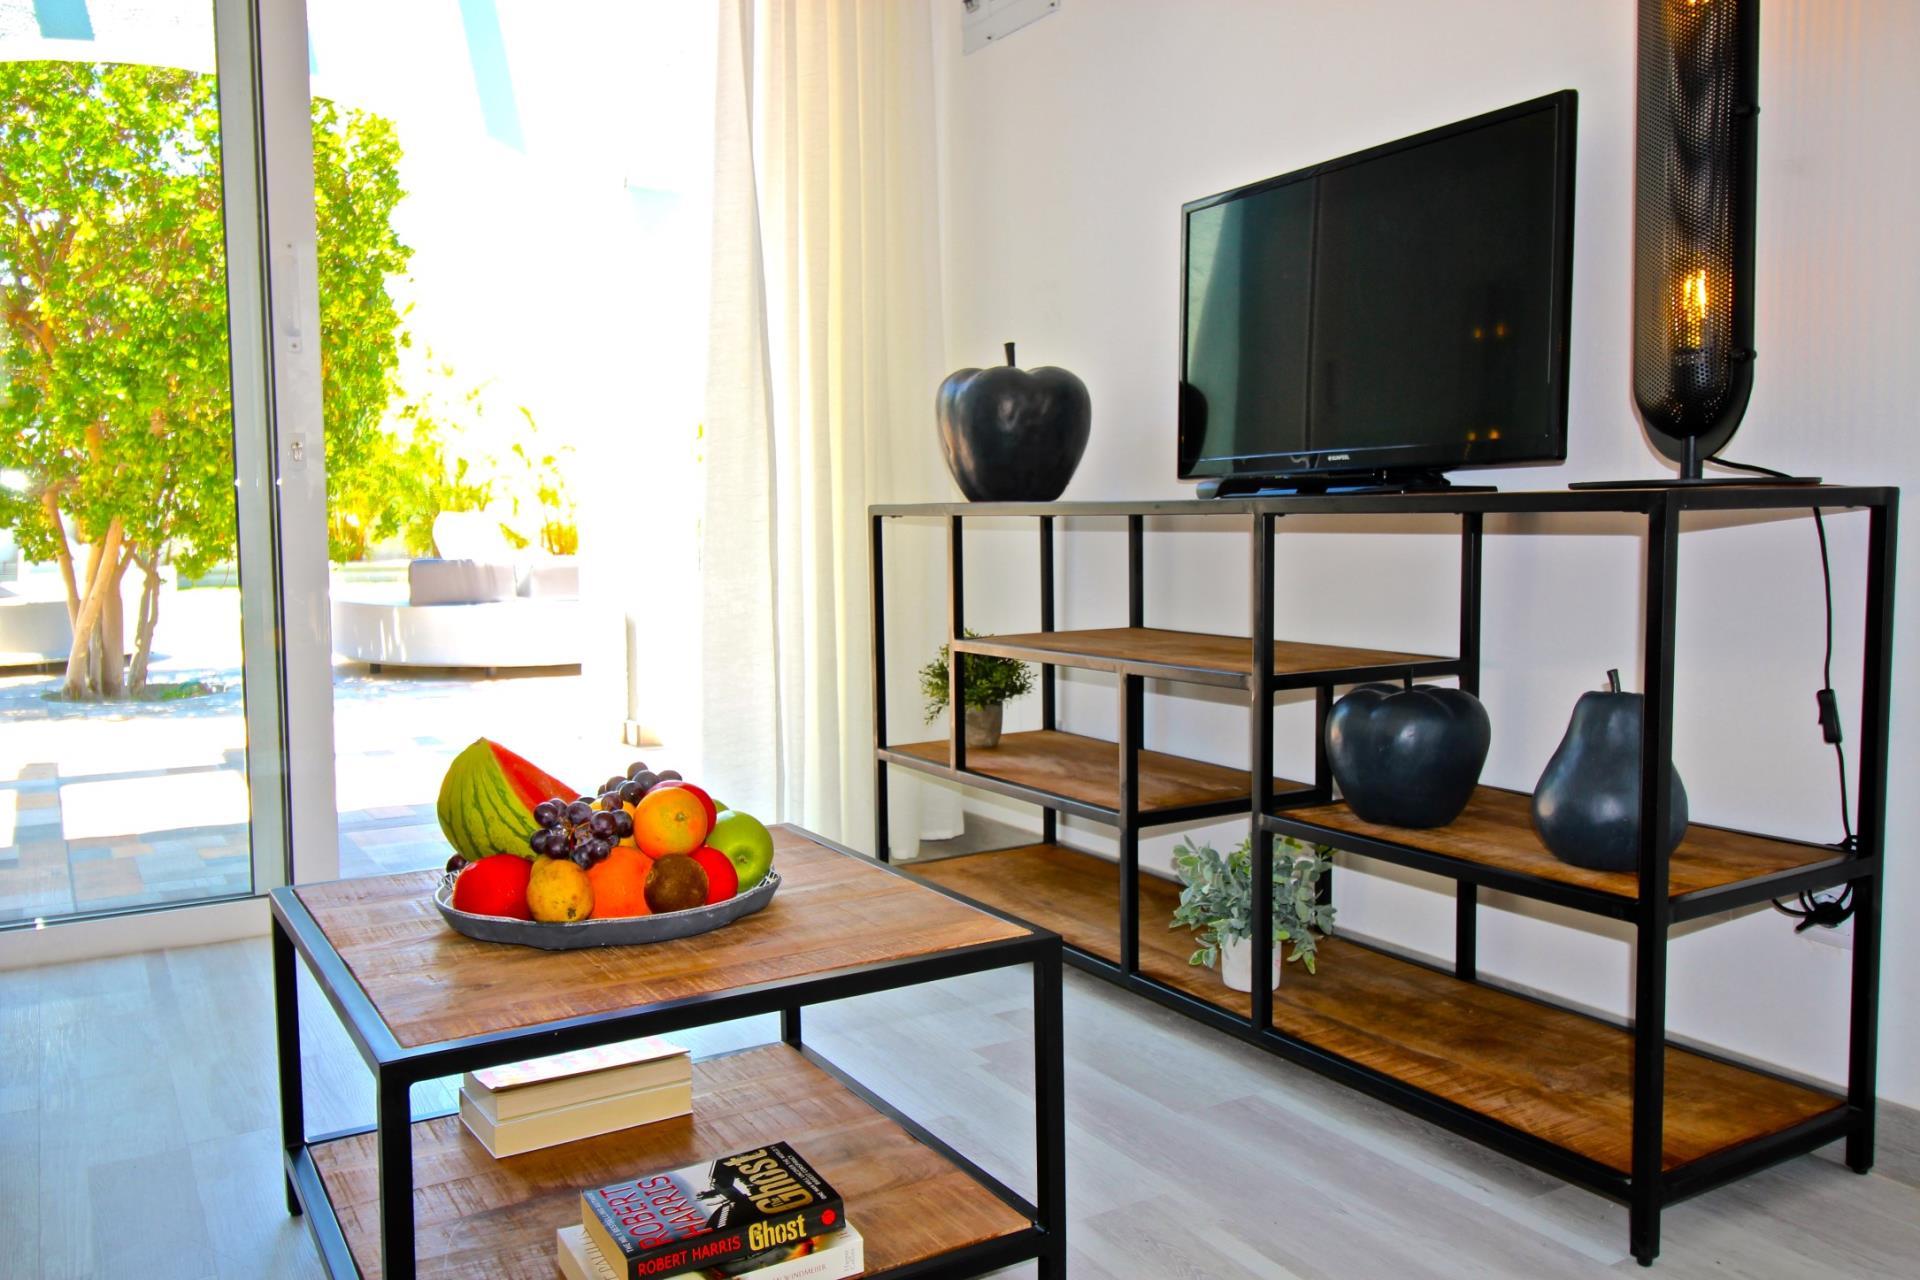 Naturisten Hotel Artika Natura Zitplek met televisie